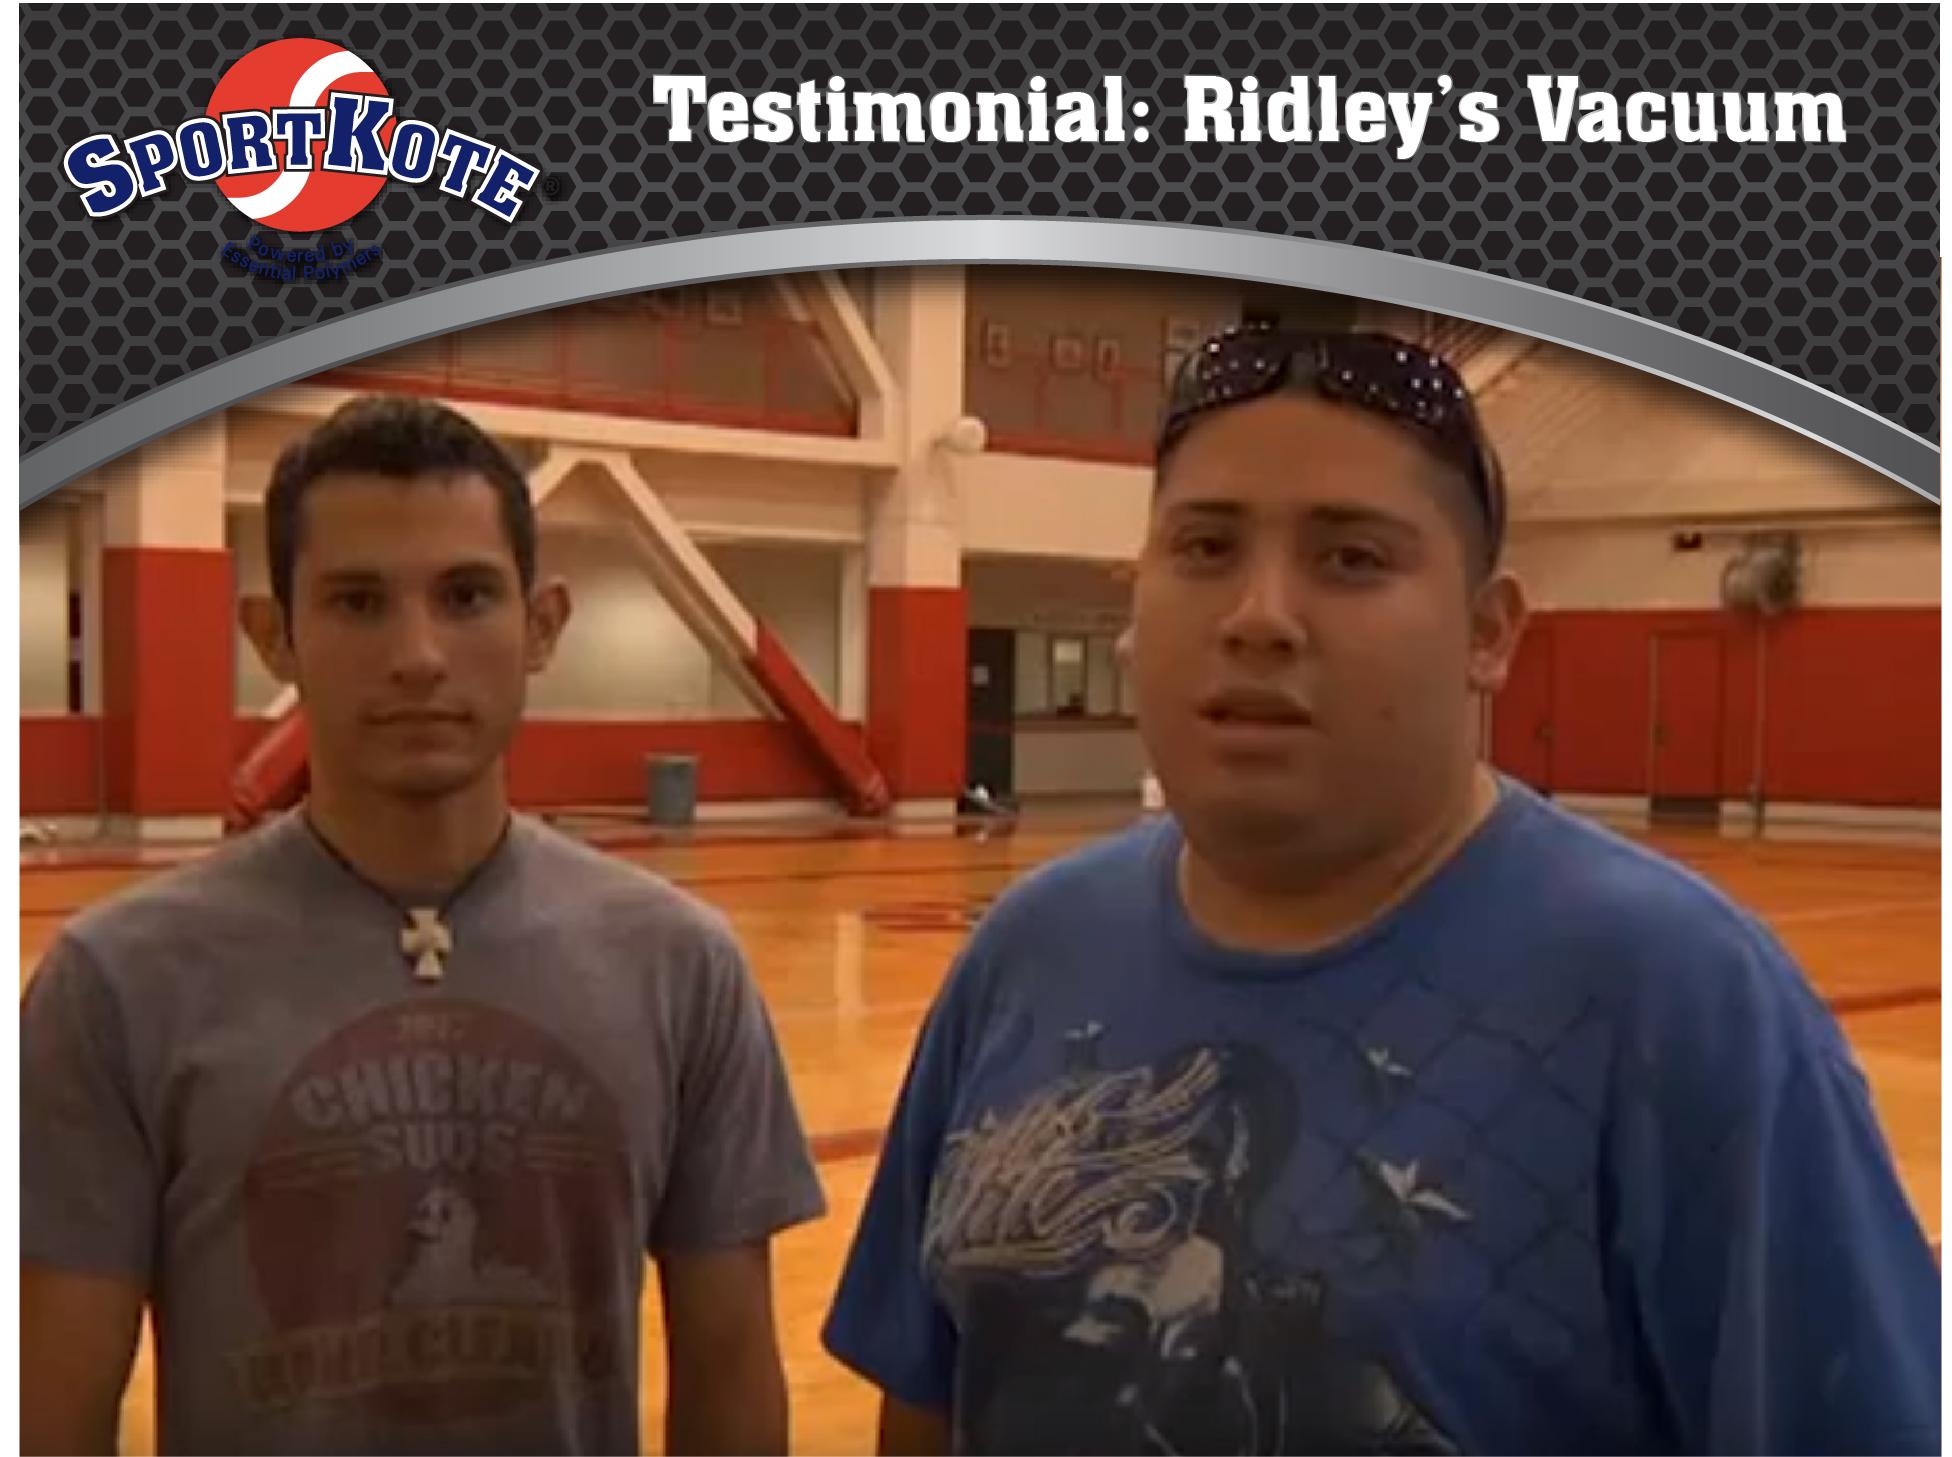 Sport Kote Testimonial Ridley Vacuum